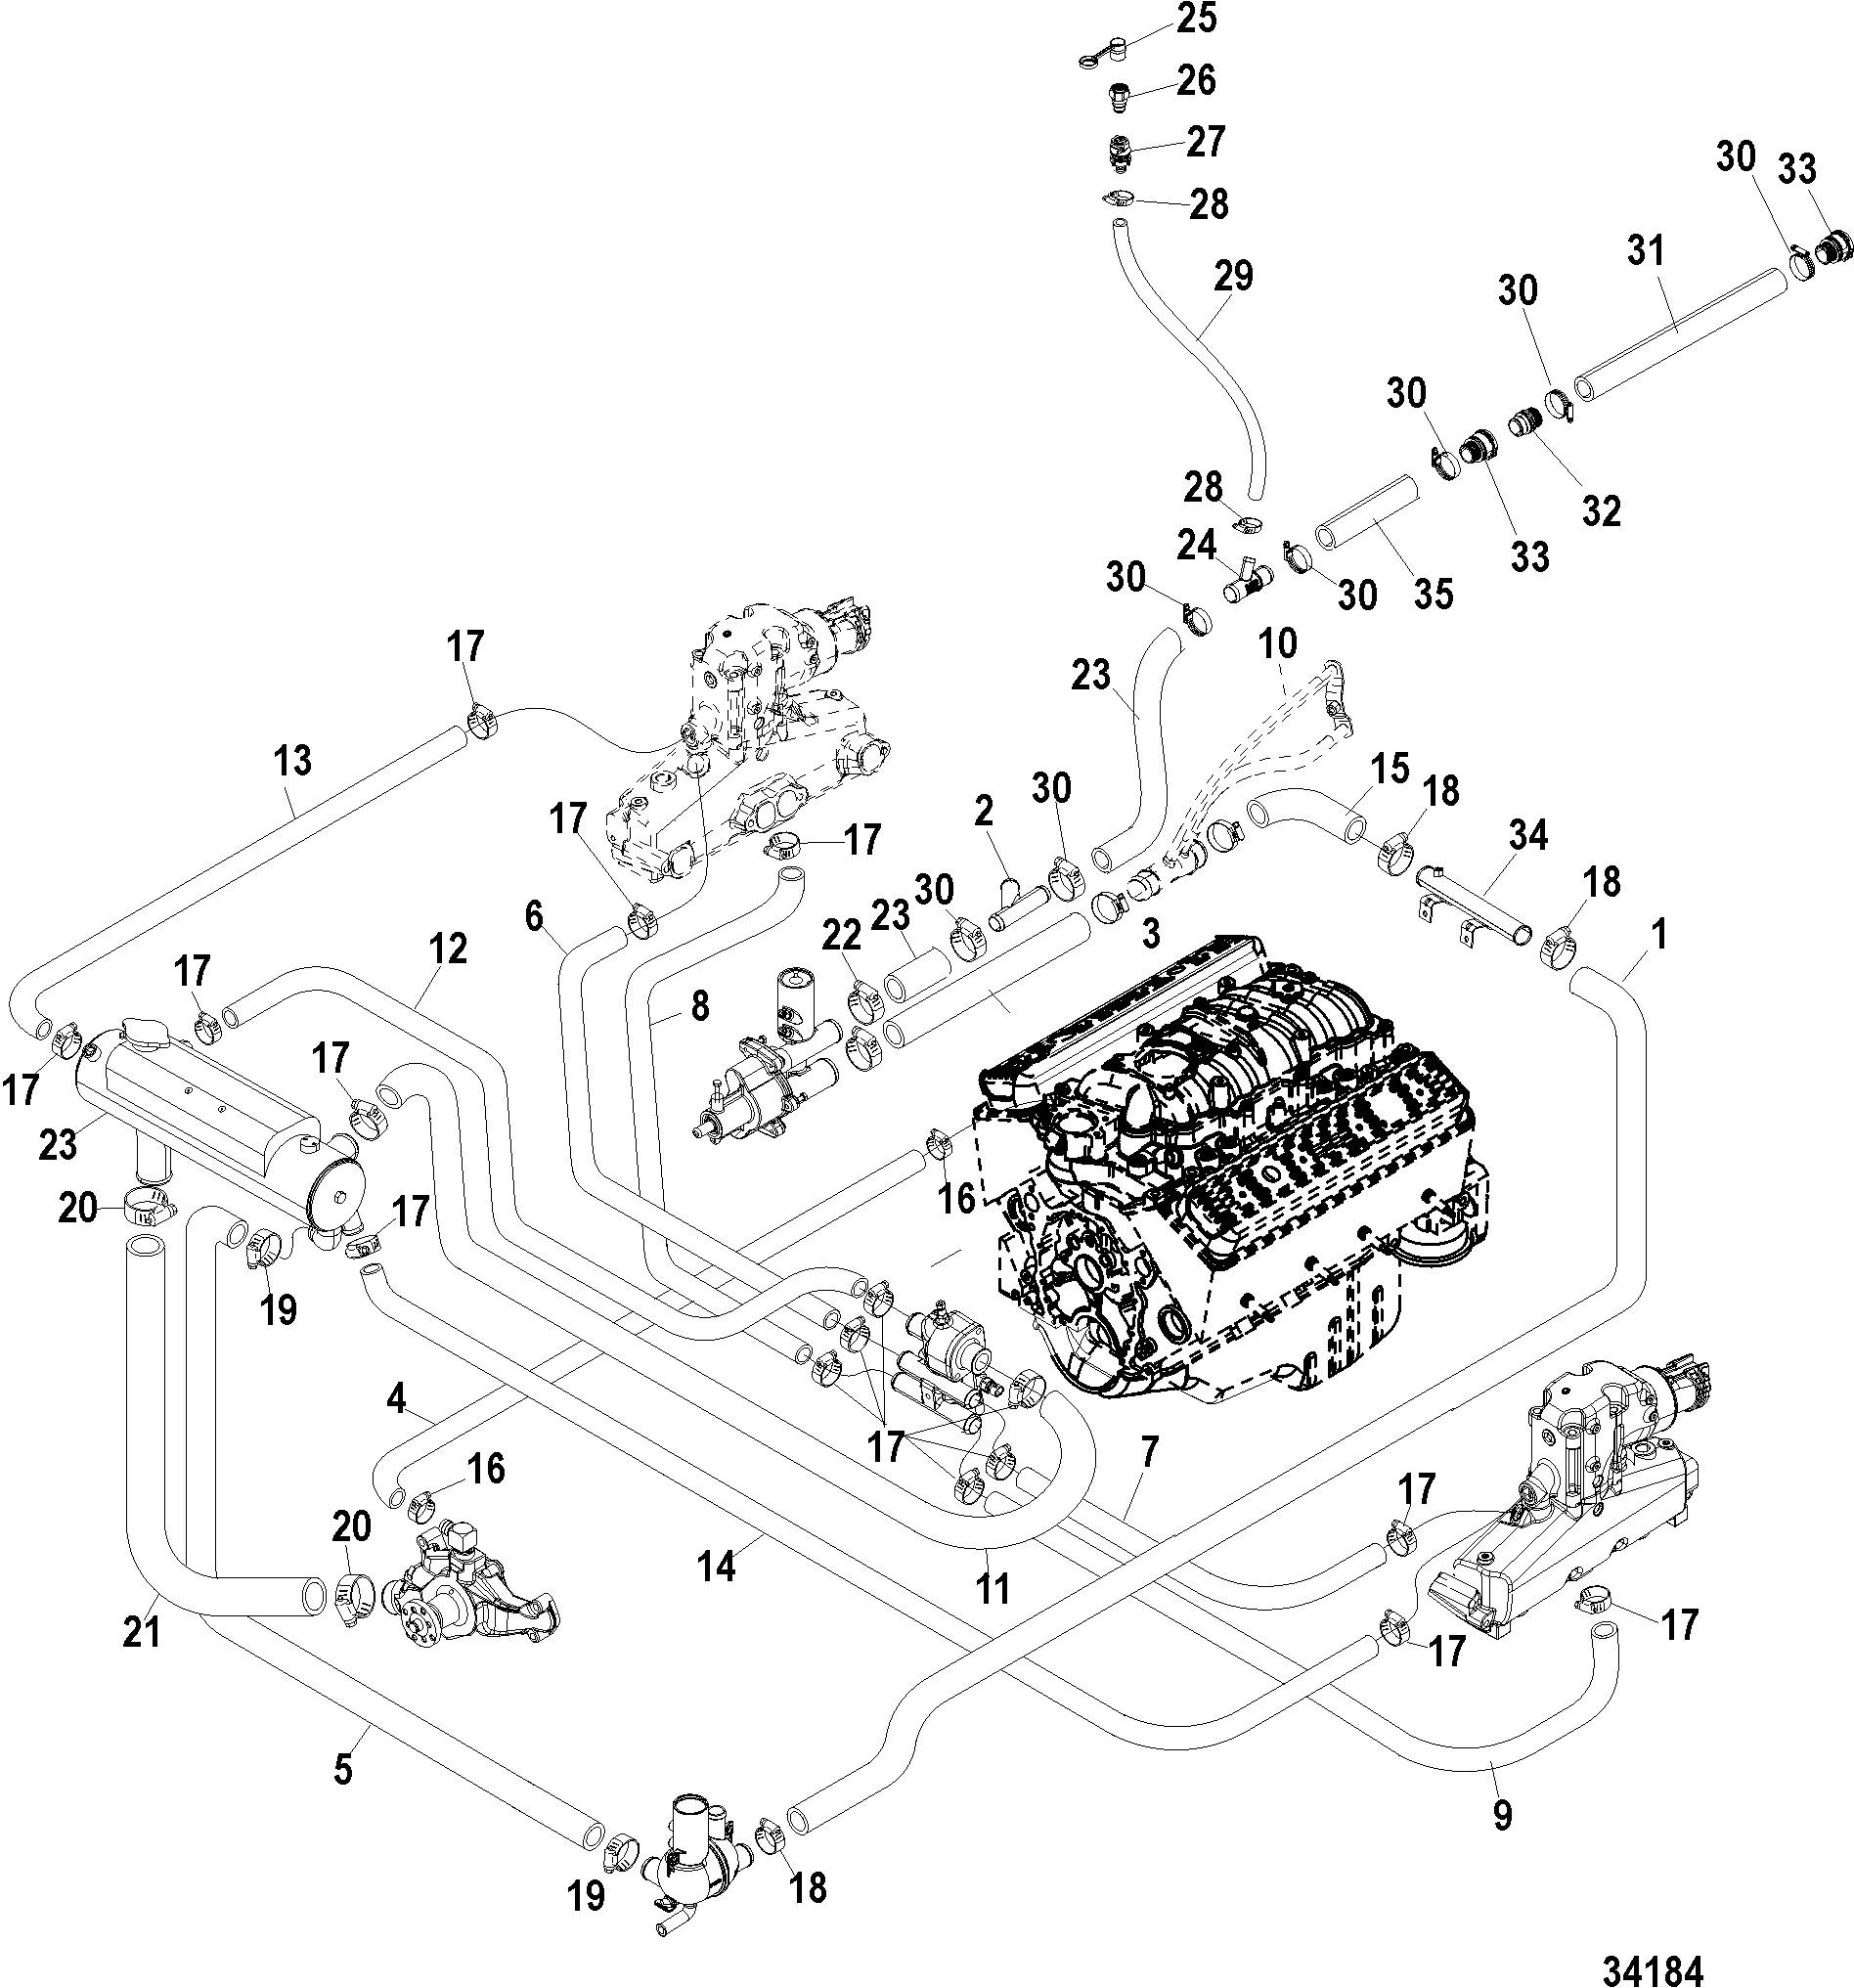 Marine Engine Cooling System Diagram Hardin Marine Closed Cooling System Bravo Of Marine Engine Cooling System Diagram